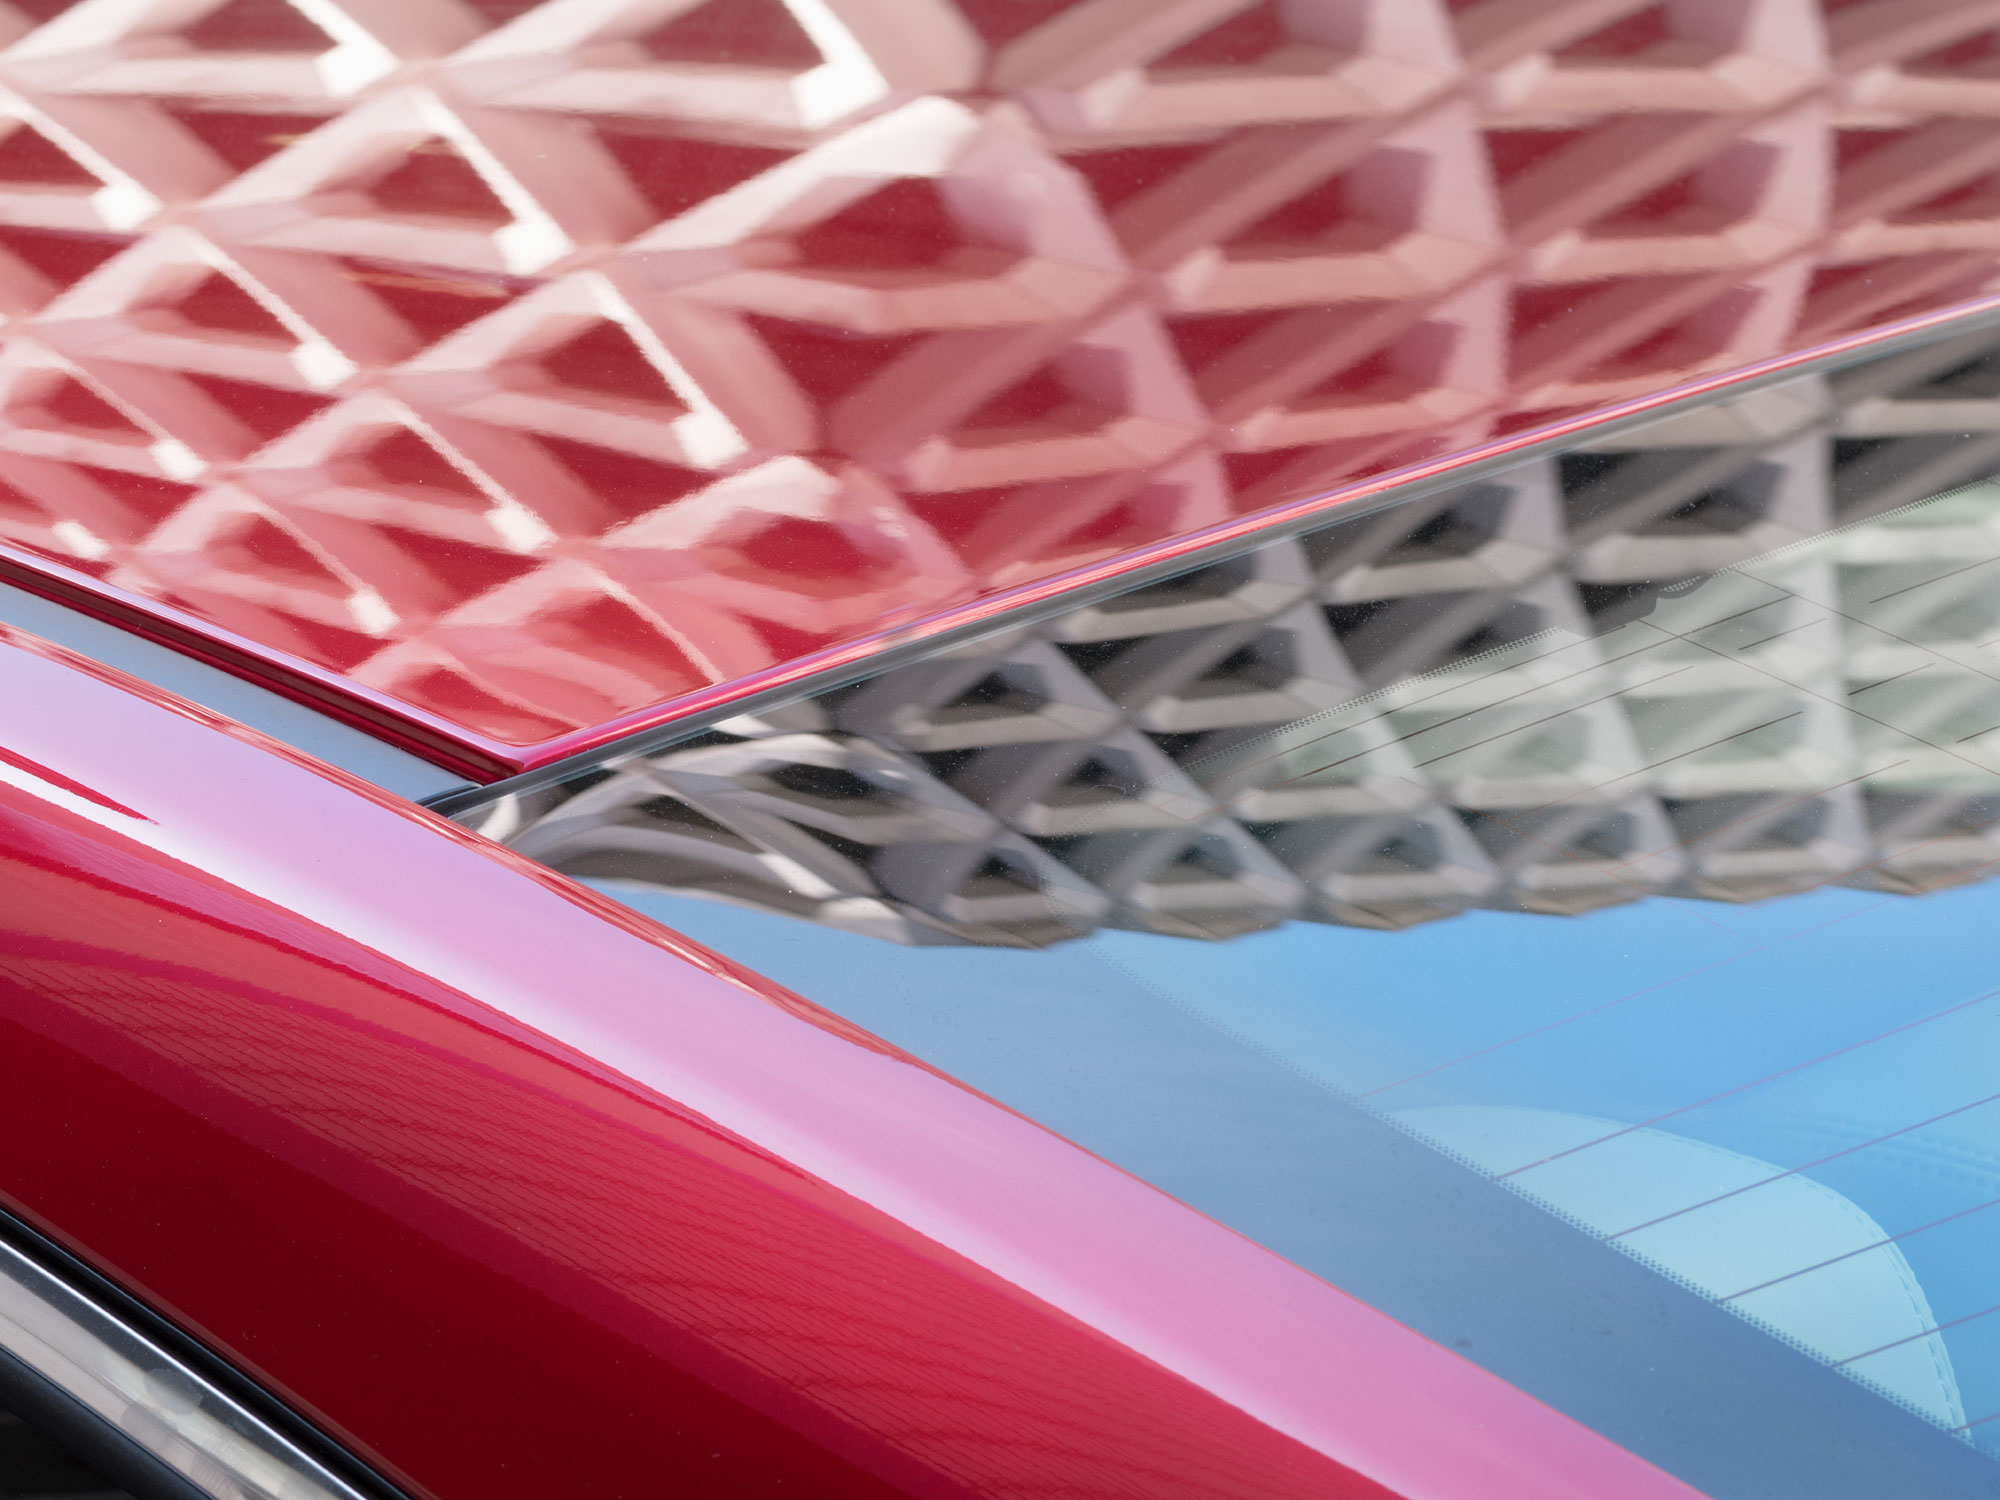 276_Mazda6_Joseph_Ford_176b.jpg